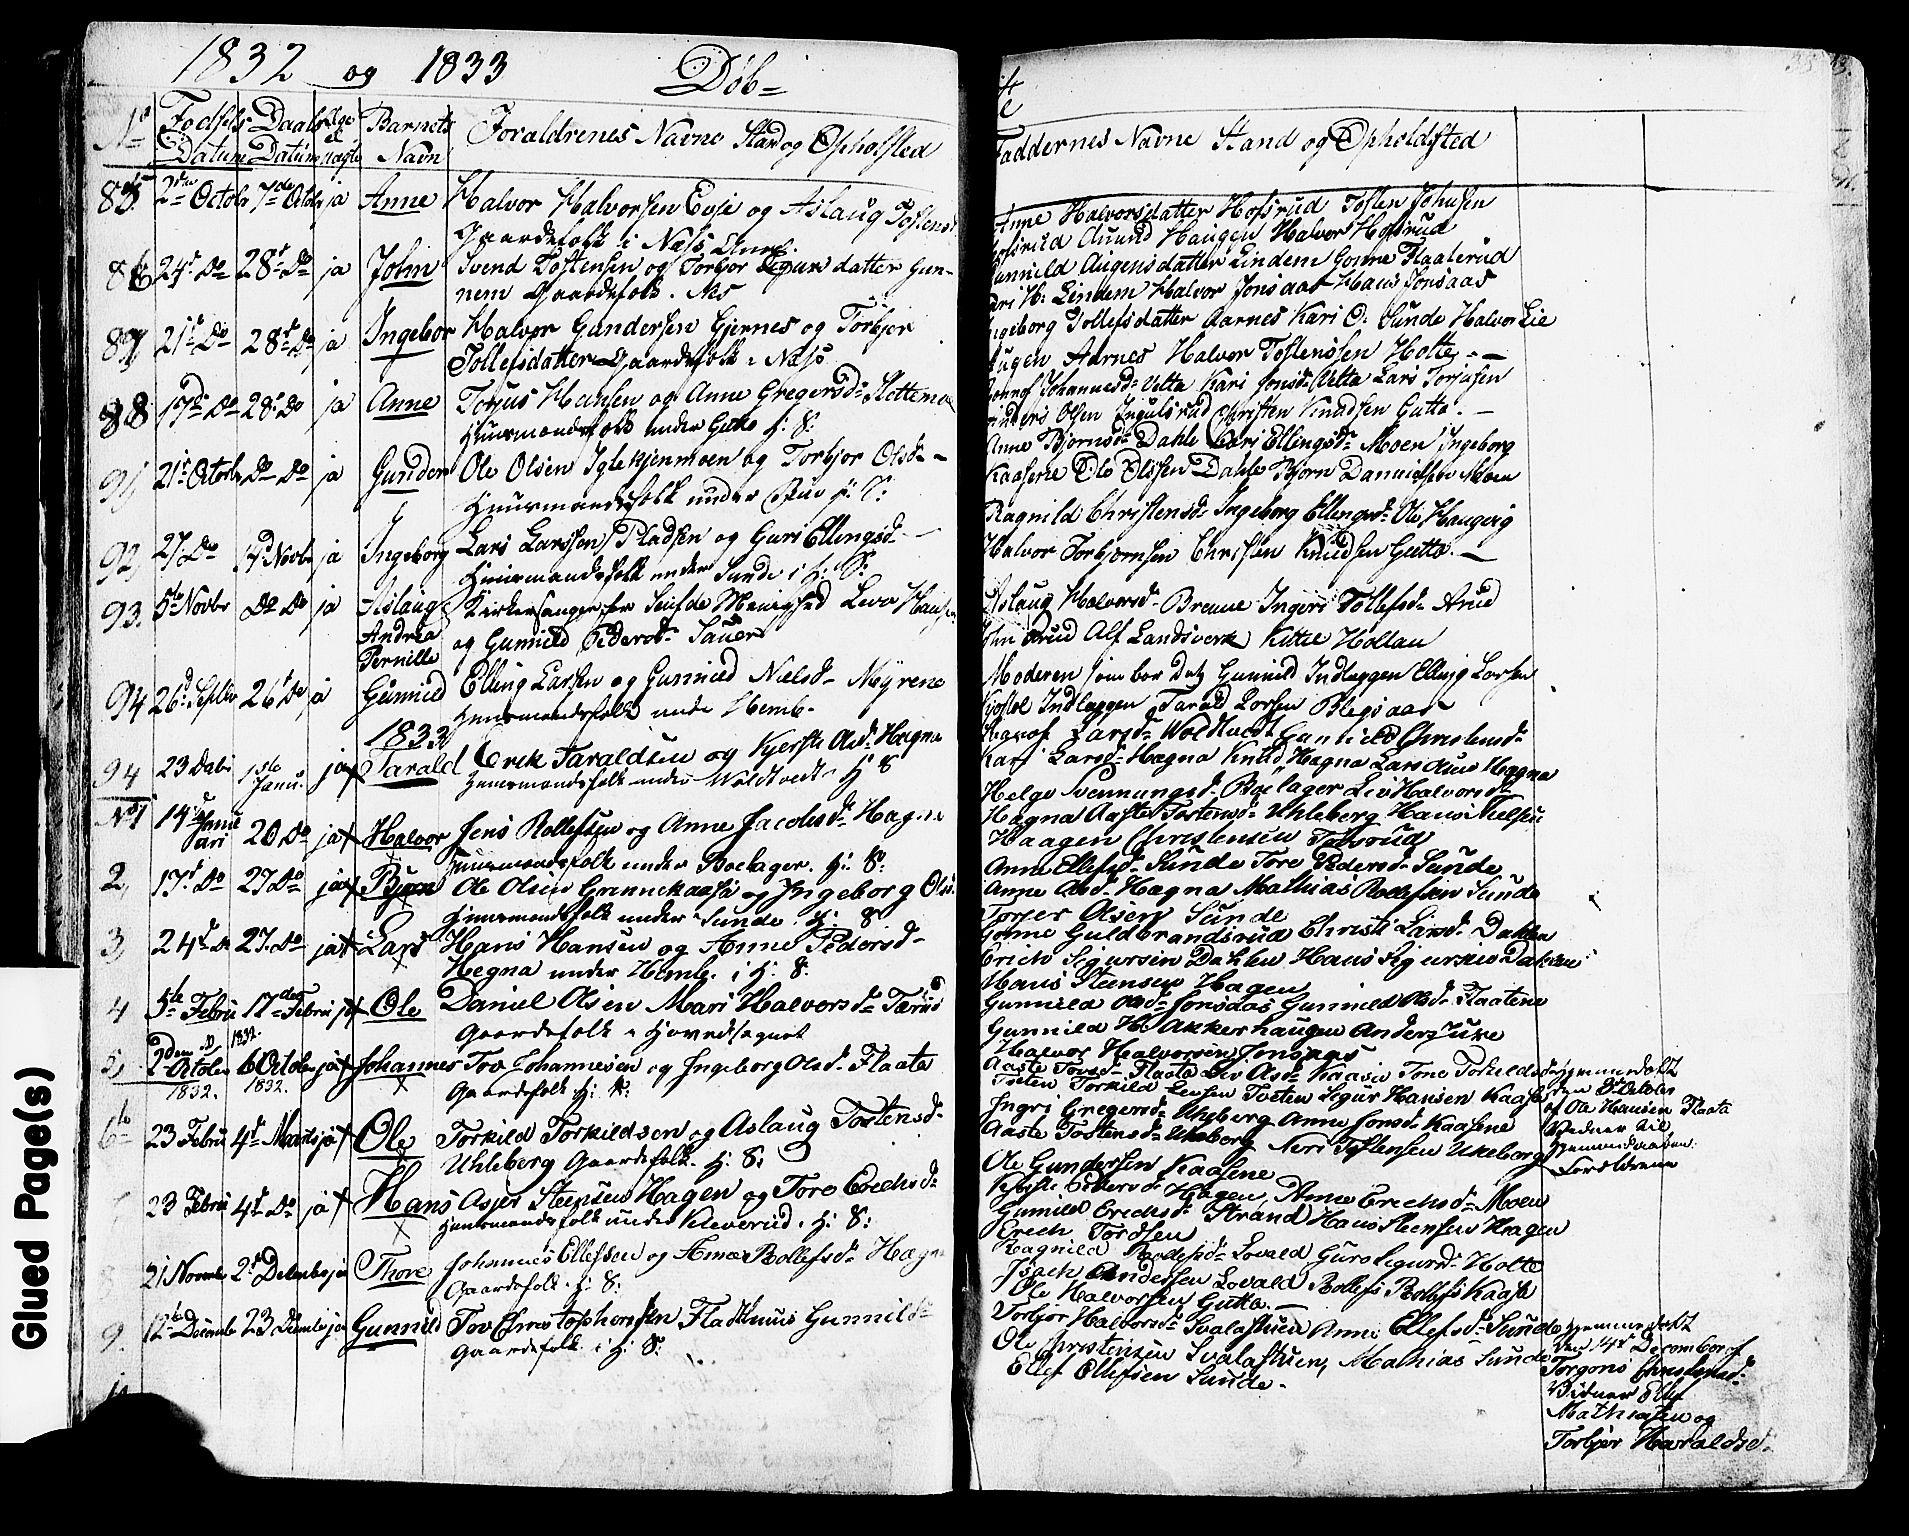 SAKO, Sauherad kirkebøker, F/Fa/L0006: Ministerialbok nr. I 6, 1827-1850, s. 38